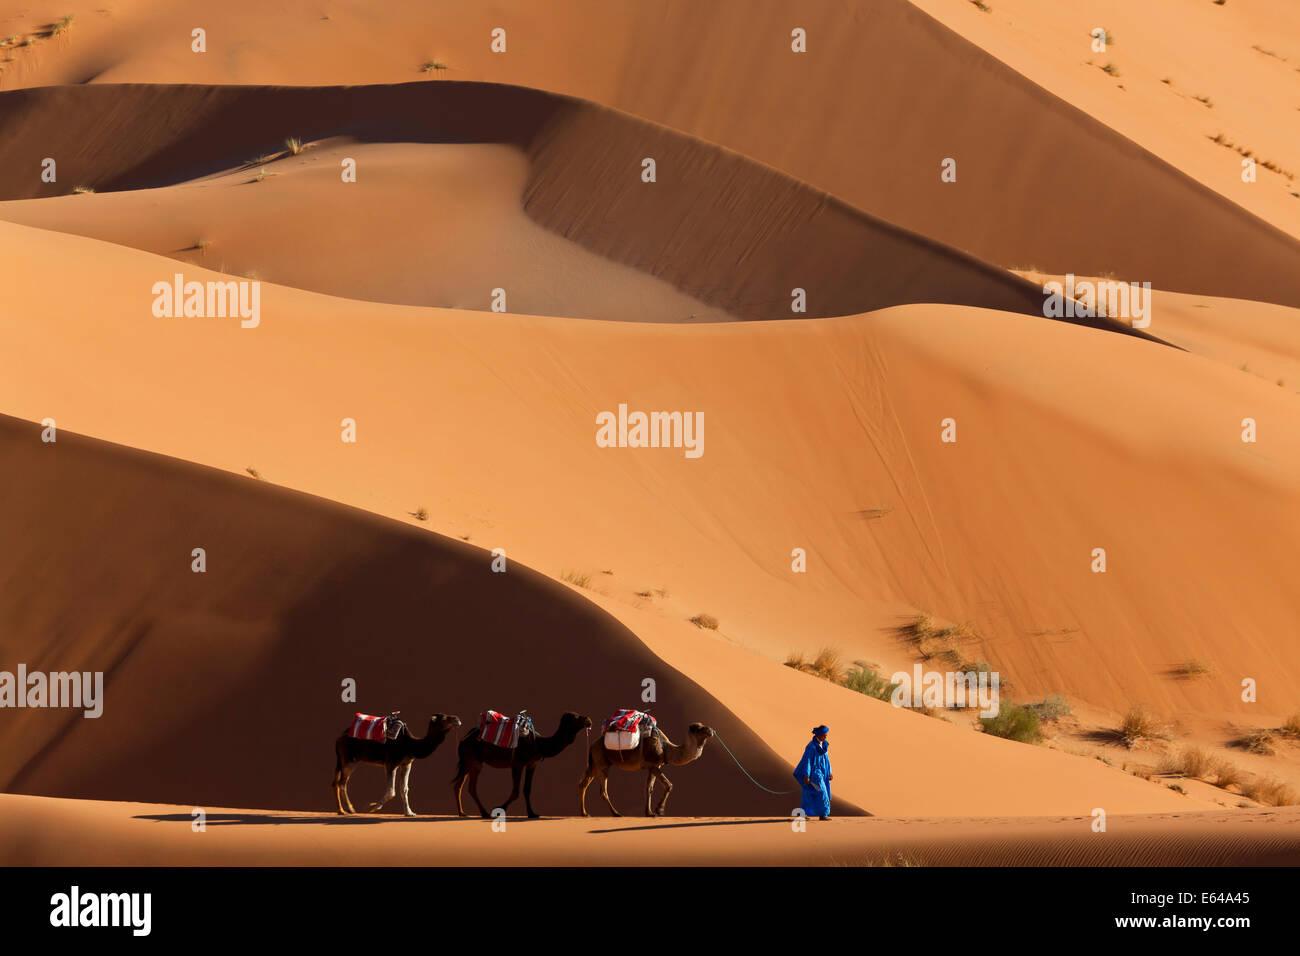 Camels & Dunes, Erg Chebbi, Sahara Desert, Morocco - Stock Image